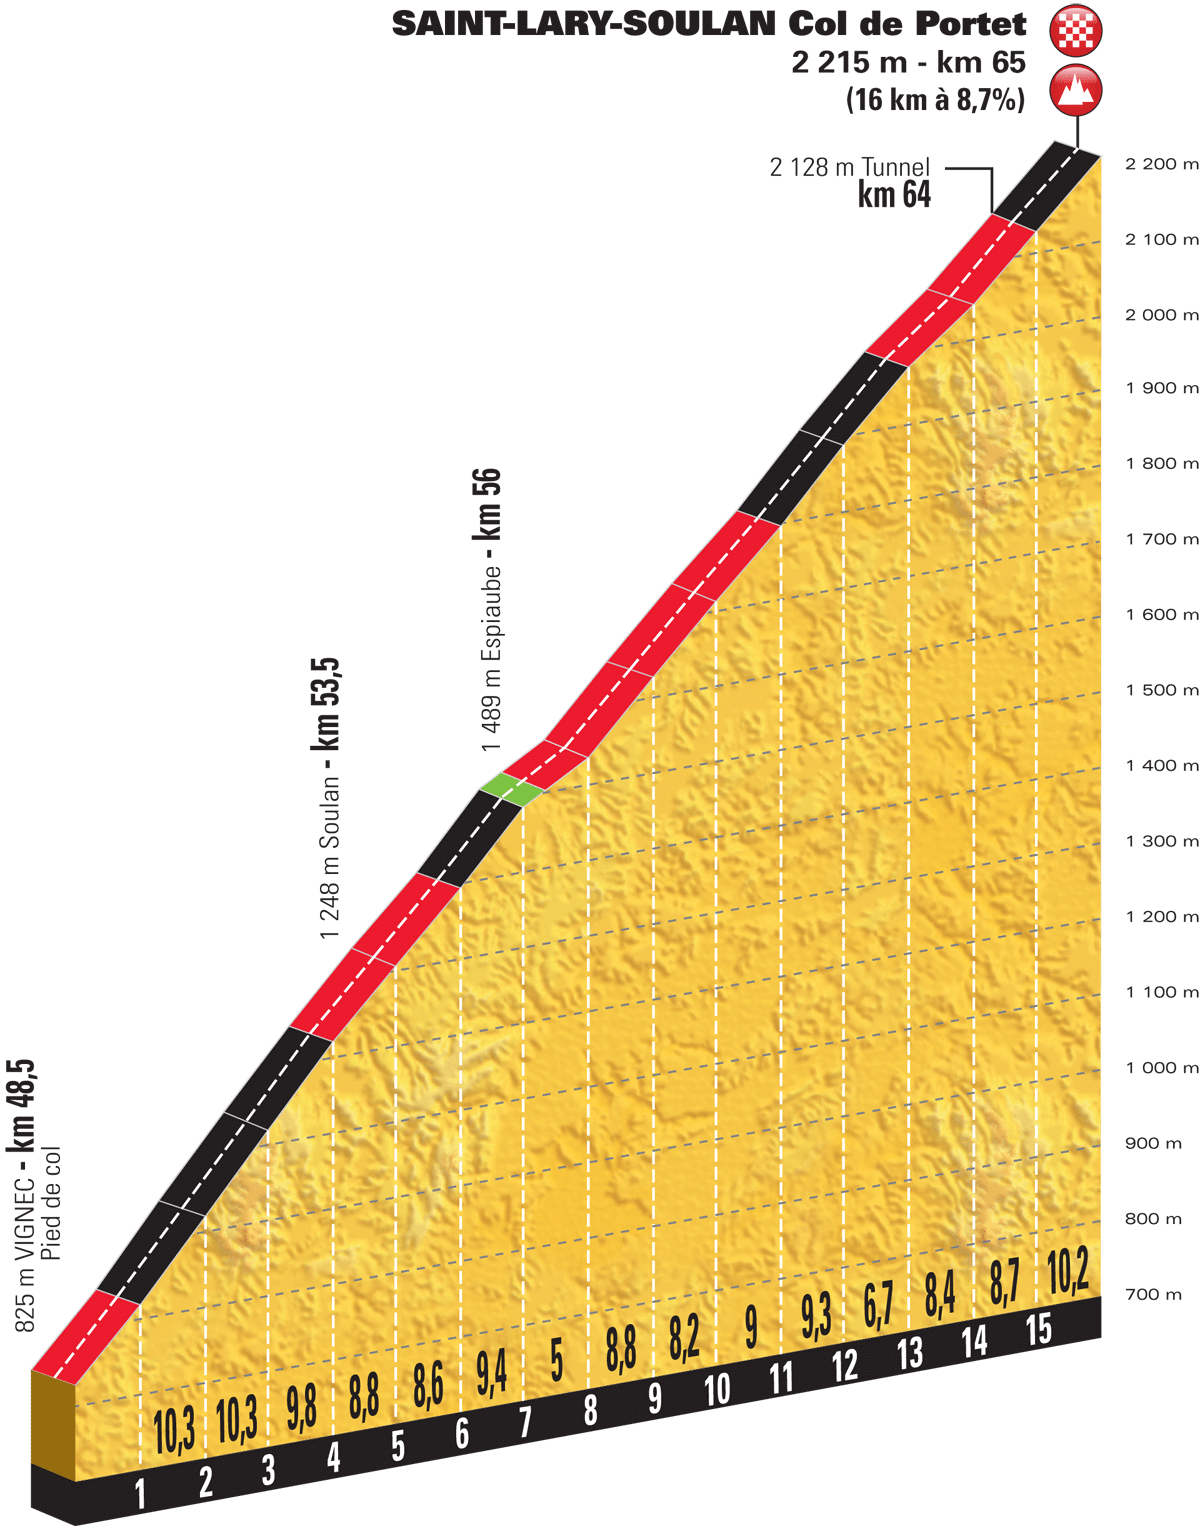 Col du Portet - Velo Peloton